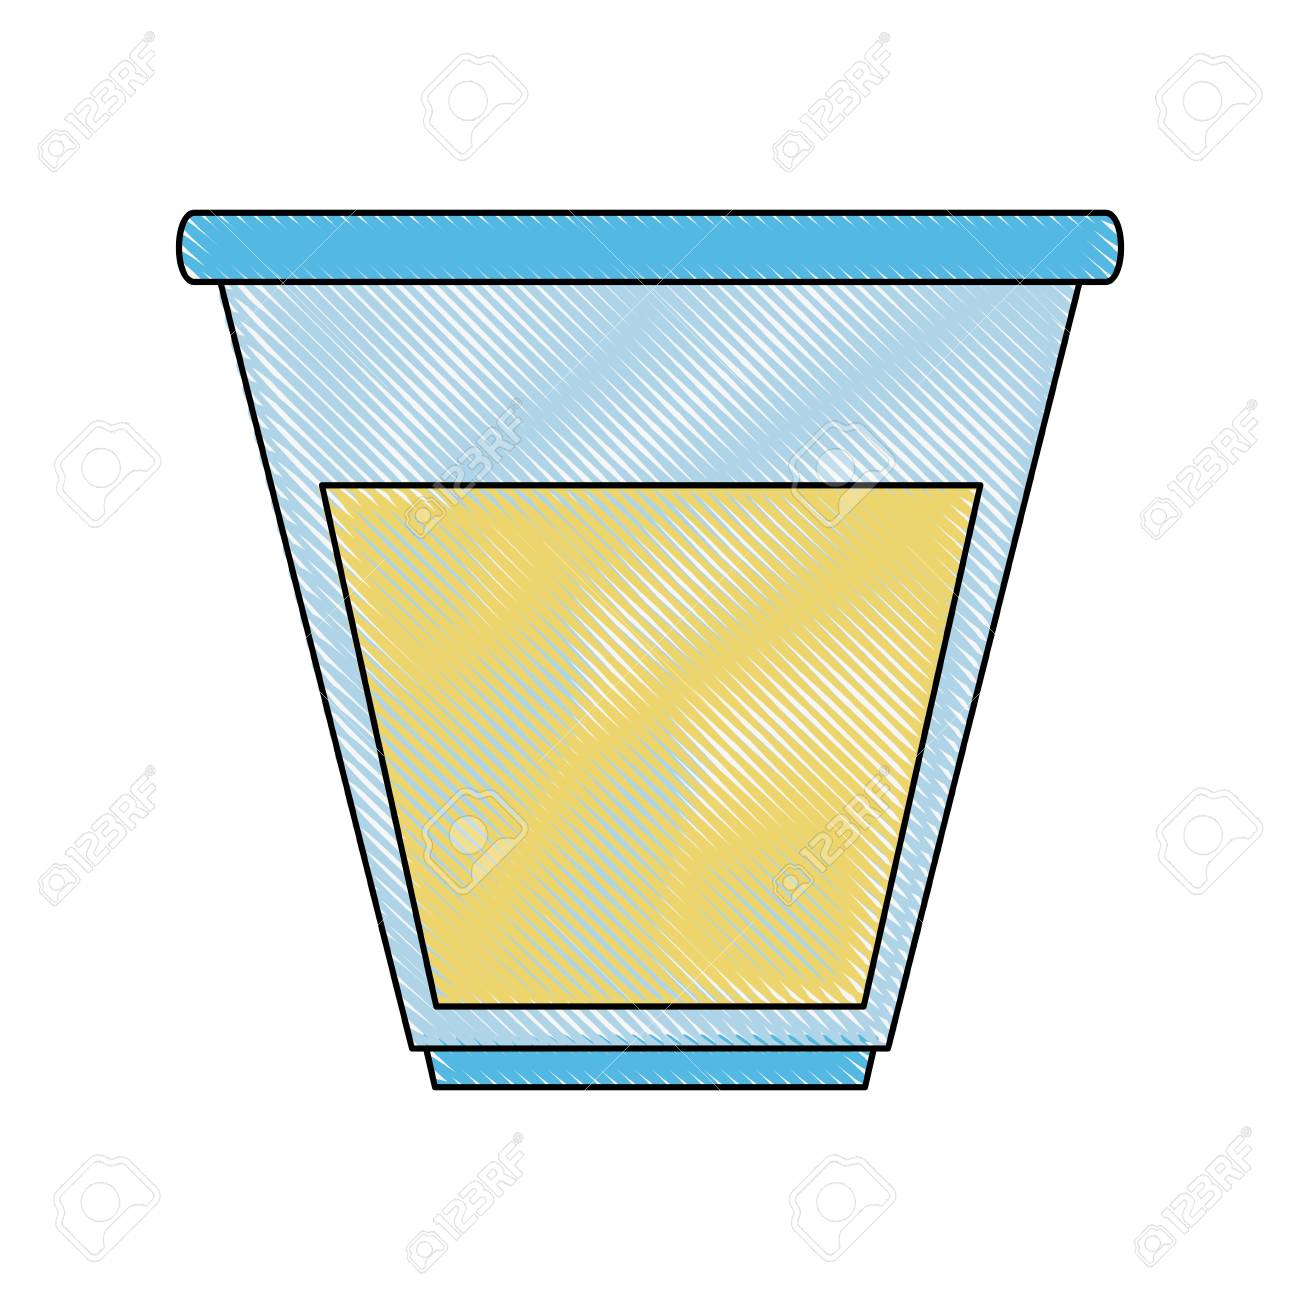 urine test container icon vector illustration graphic design royalty rh 123rf com